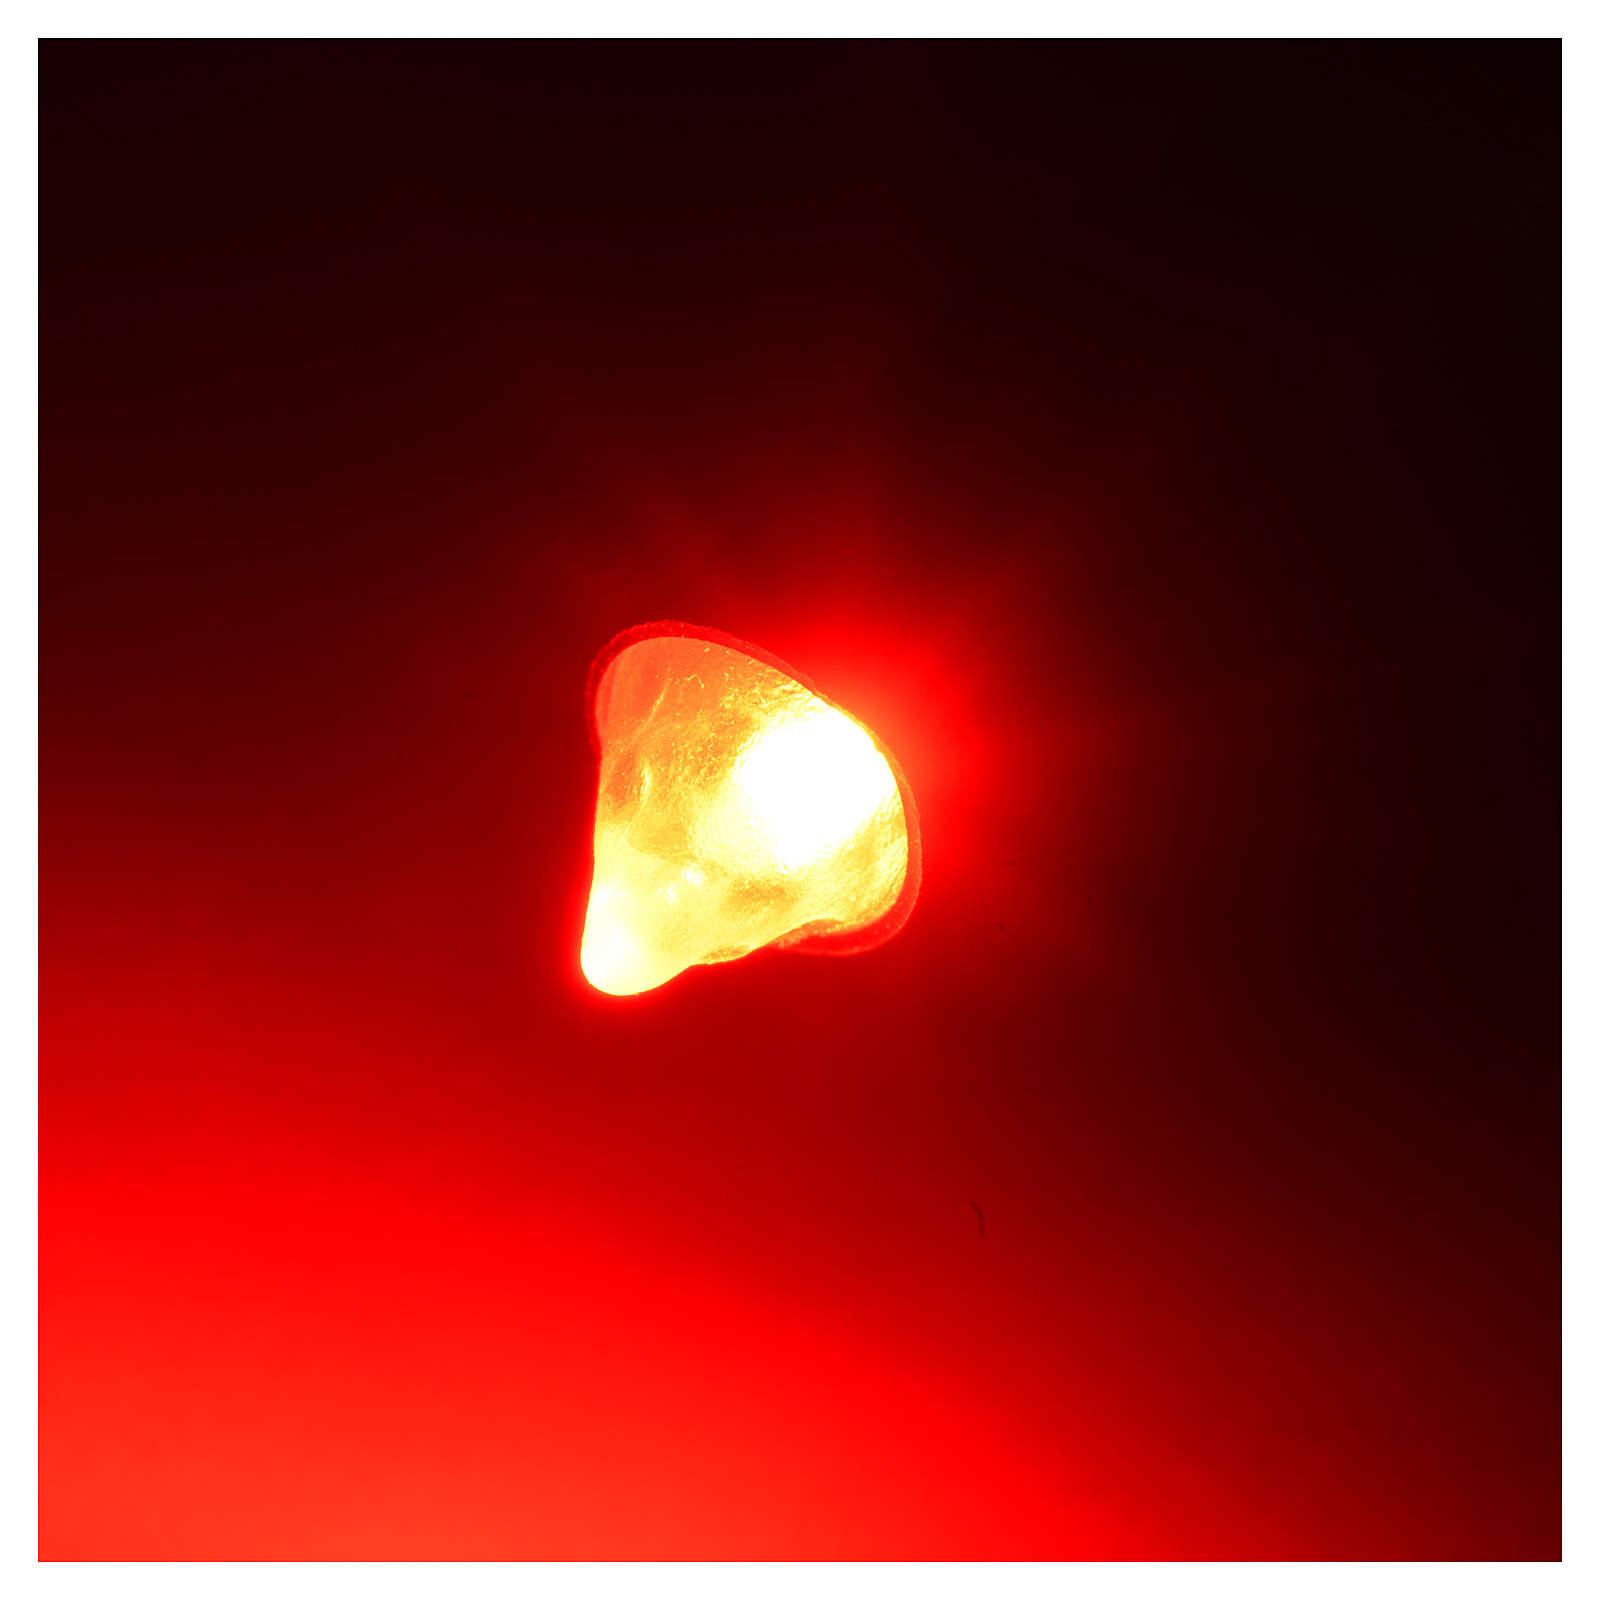 Led antorcha rojo diám. 5 mm belén 4